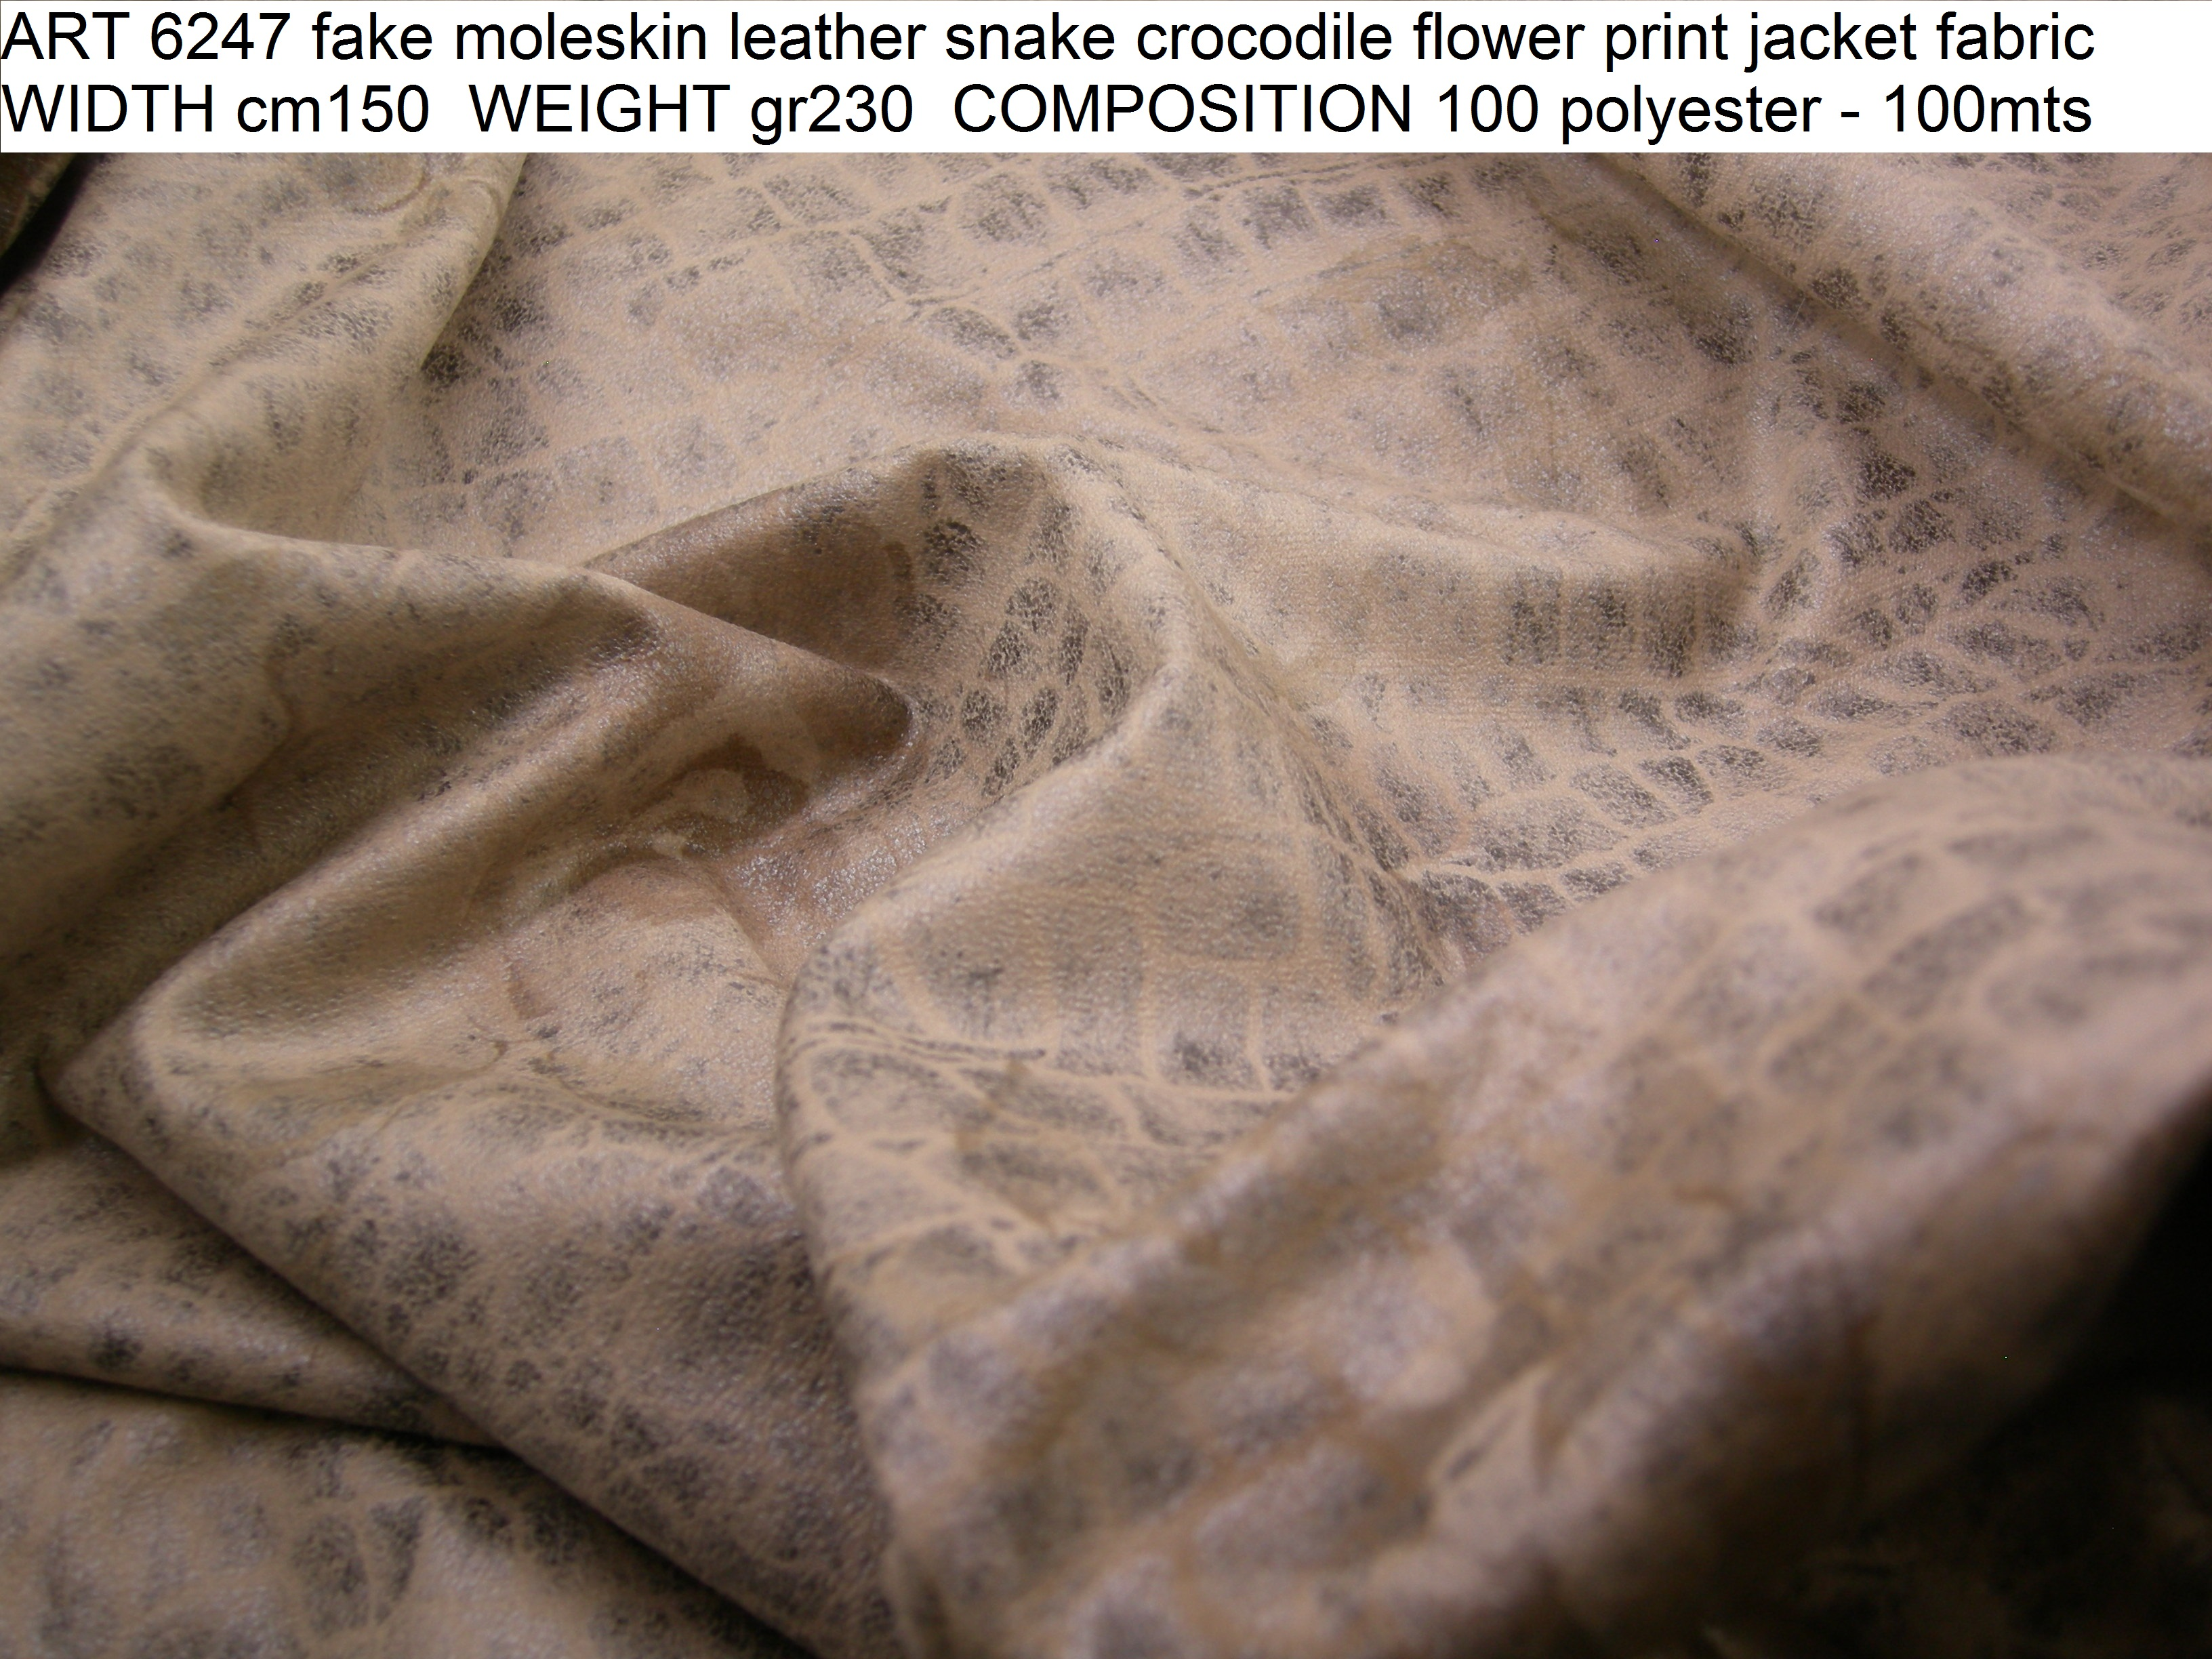 ART 6247 fake moleskin leather snake crocodile flower print jacket fabric WIDTH cm150 WEIGHT gr230 COMPOSITION 100 polyester - 100mts